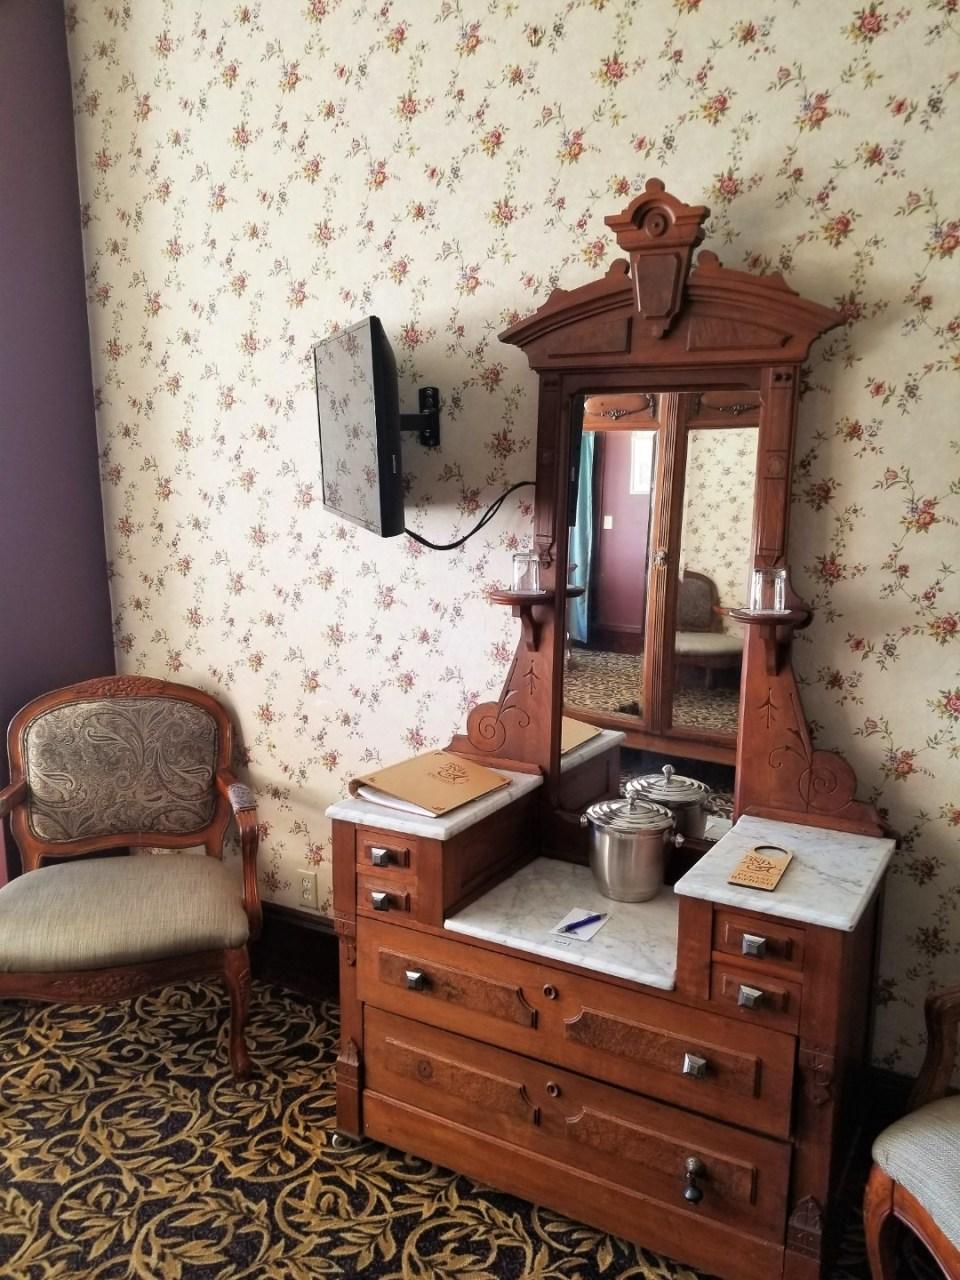 Standard Furnishing at the Inn